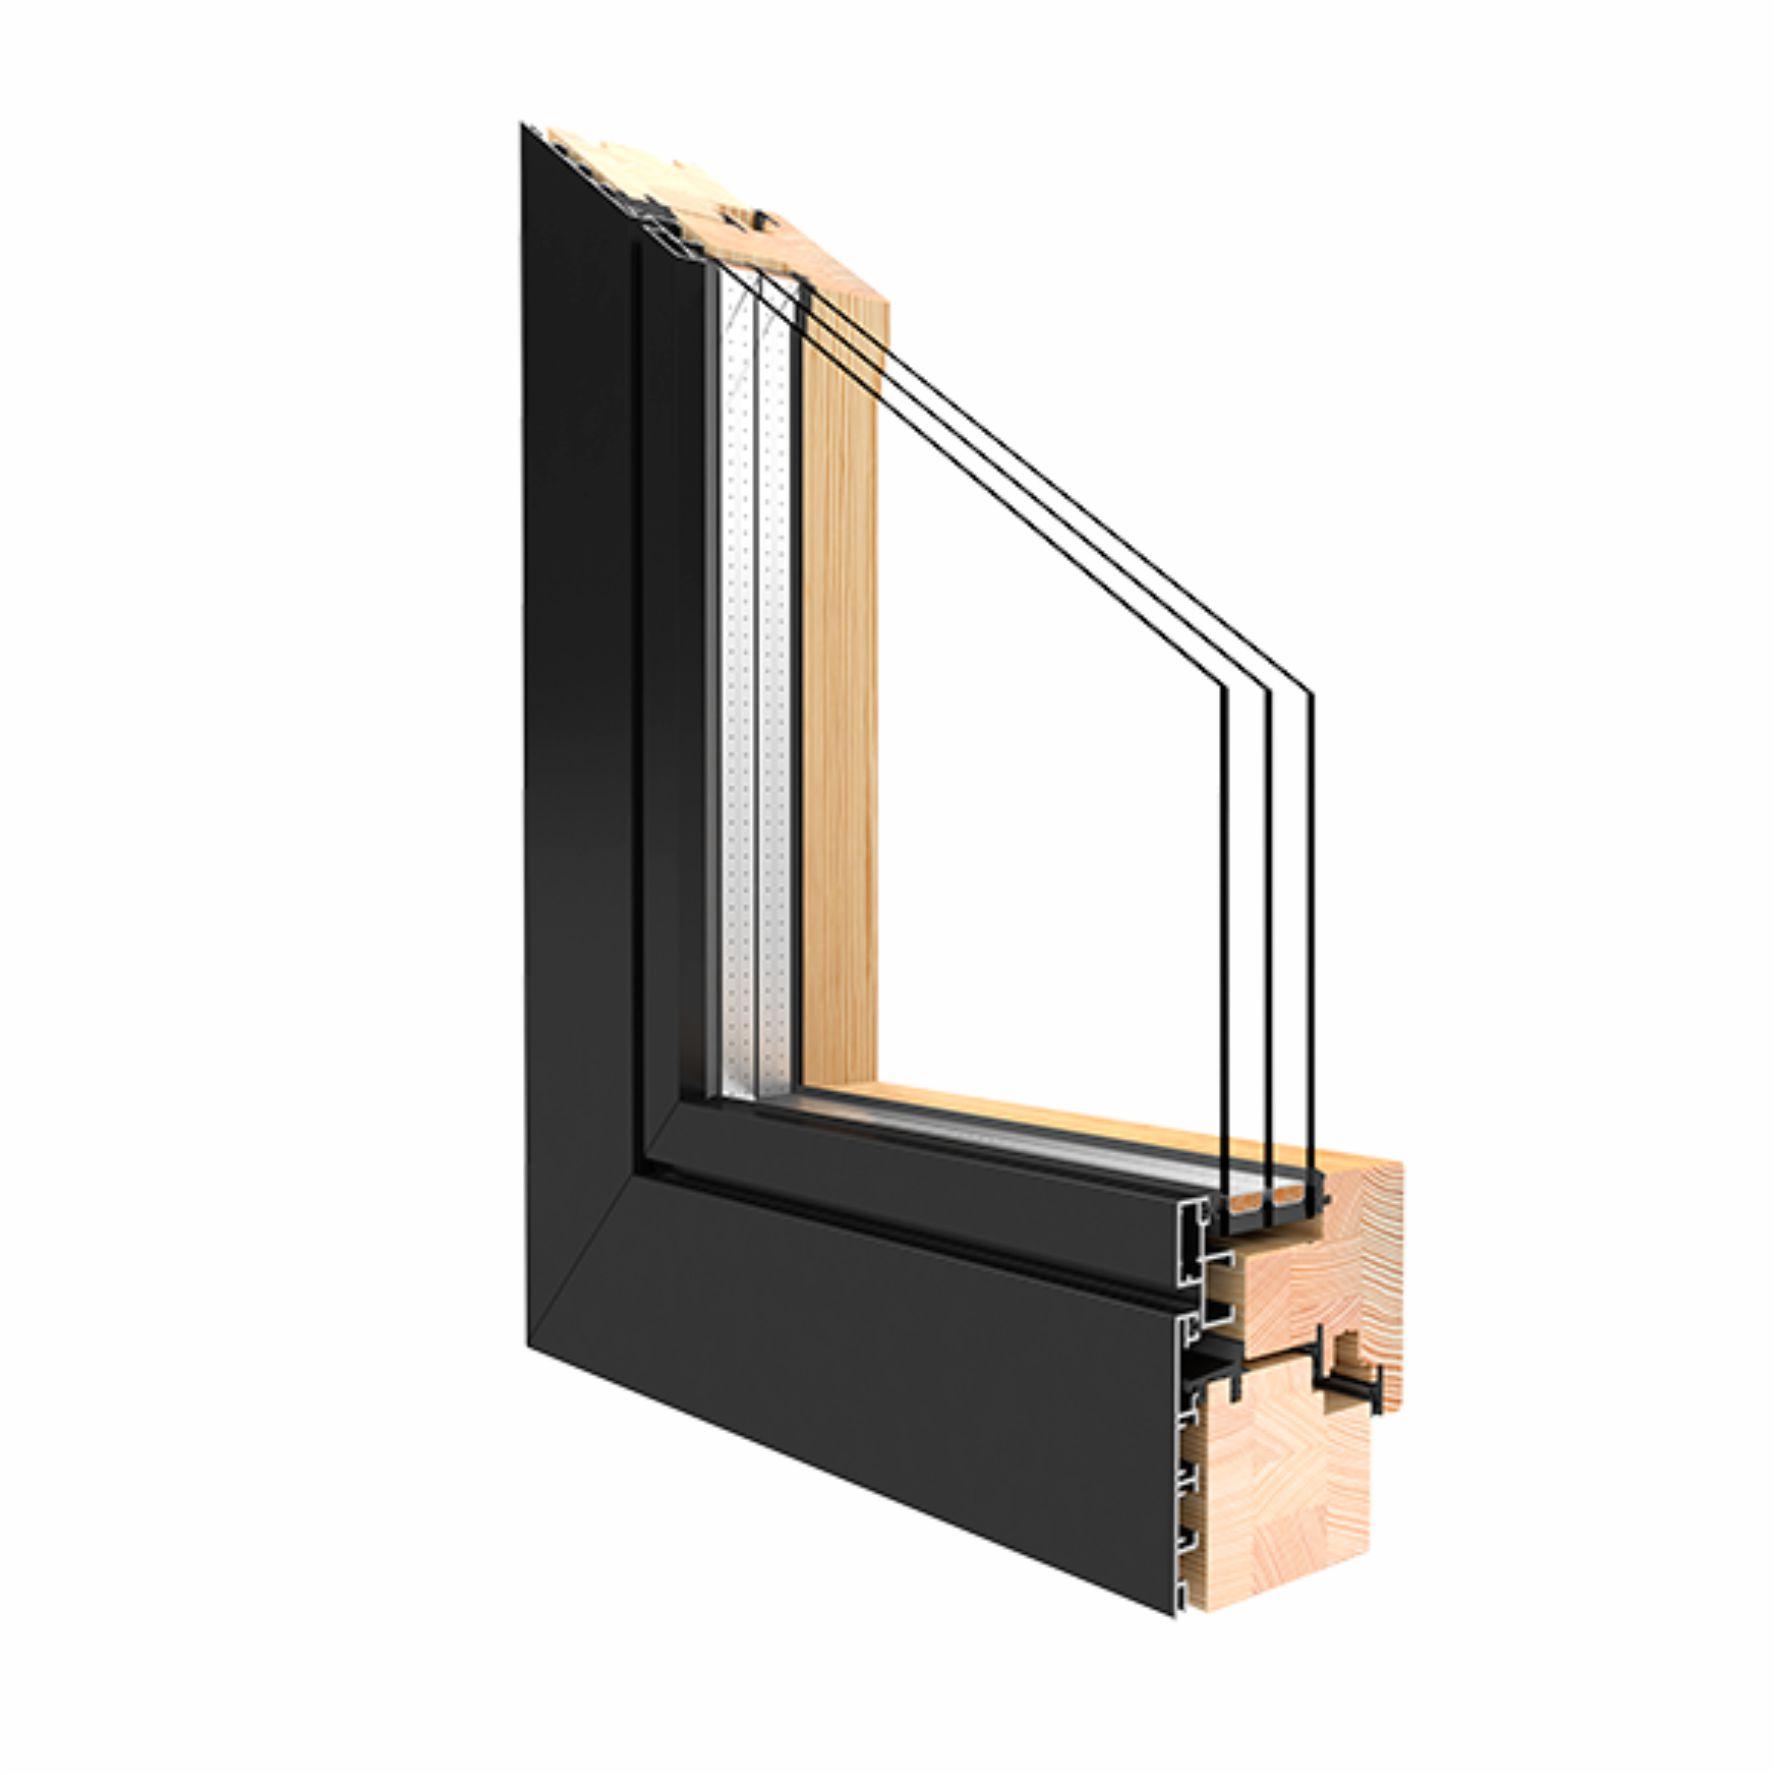 Full Size of Holz Alu Fenster Preise Pro Qm Aluminium Kosten Preis Preisliste Unilux Holz Alu Erfahrungen Preisunterschied Leistung M2 Josko Preisvergleich Eiche Fenster Holz Alu Fenster Preise